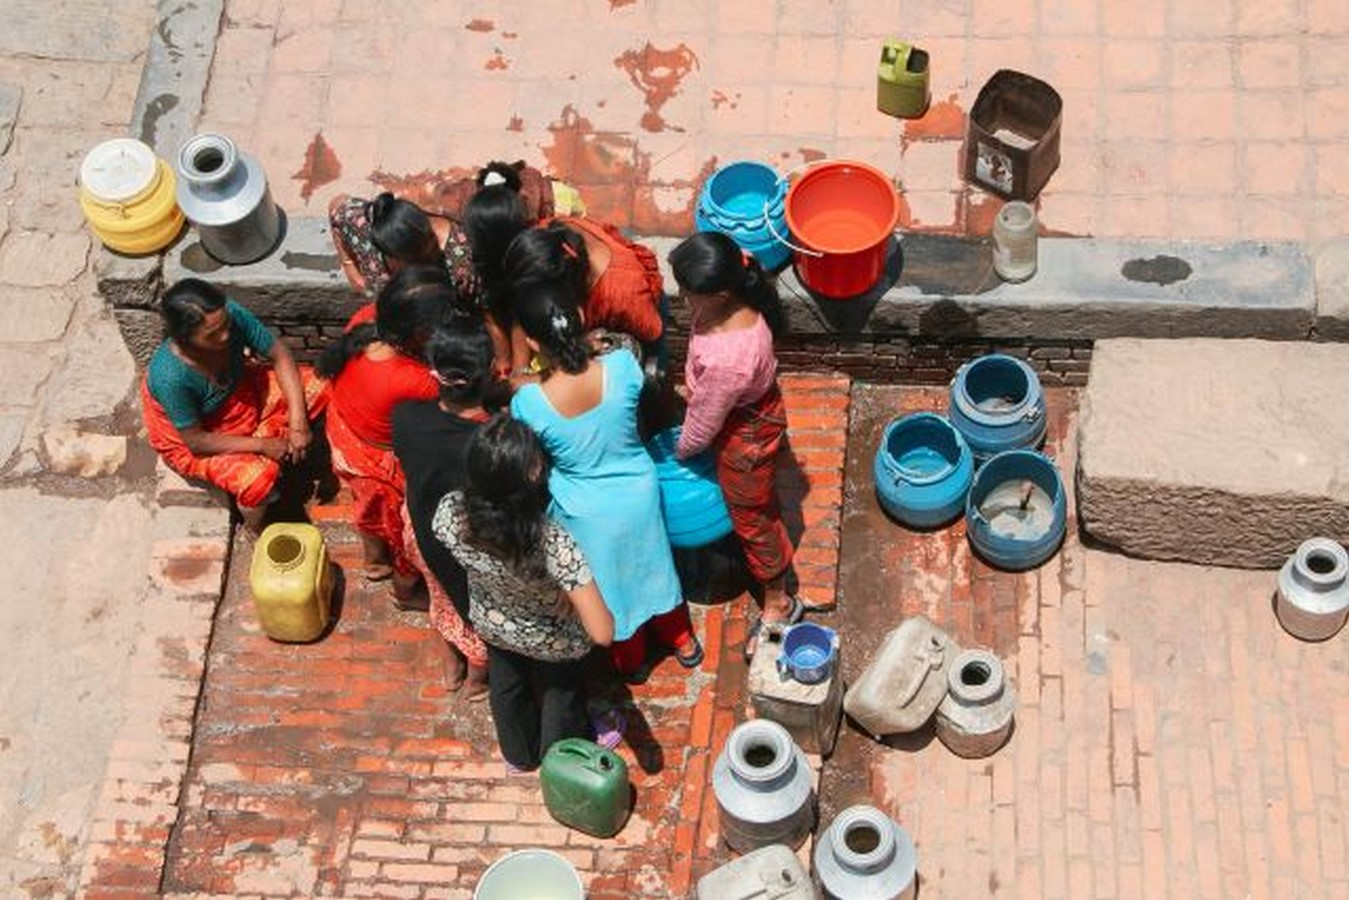 10 Ways Urban planning can help fight Pandemics - Sheet5